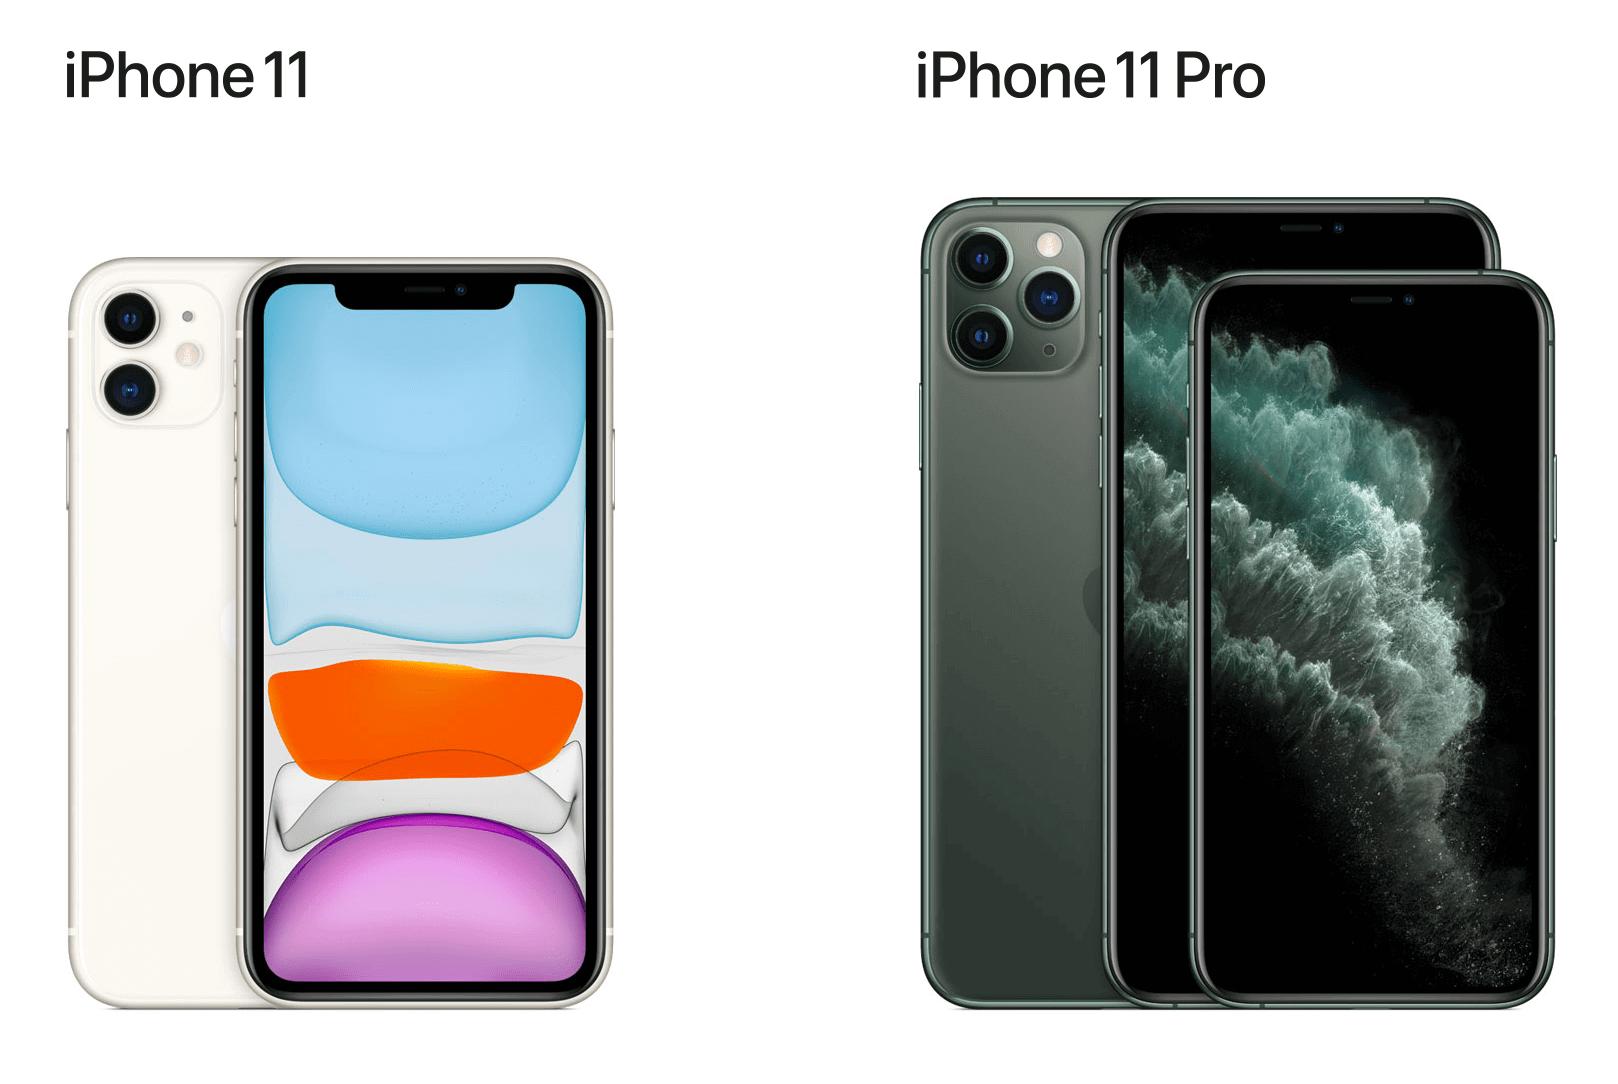 iPhone 11,黑色和白色),跟11有差別,iphone 11 128 白,iphone 11 128g 白色,0.5&.v=1566956148115